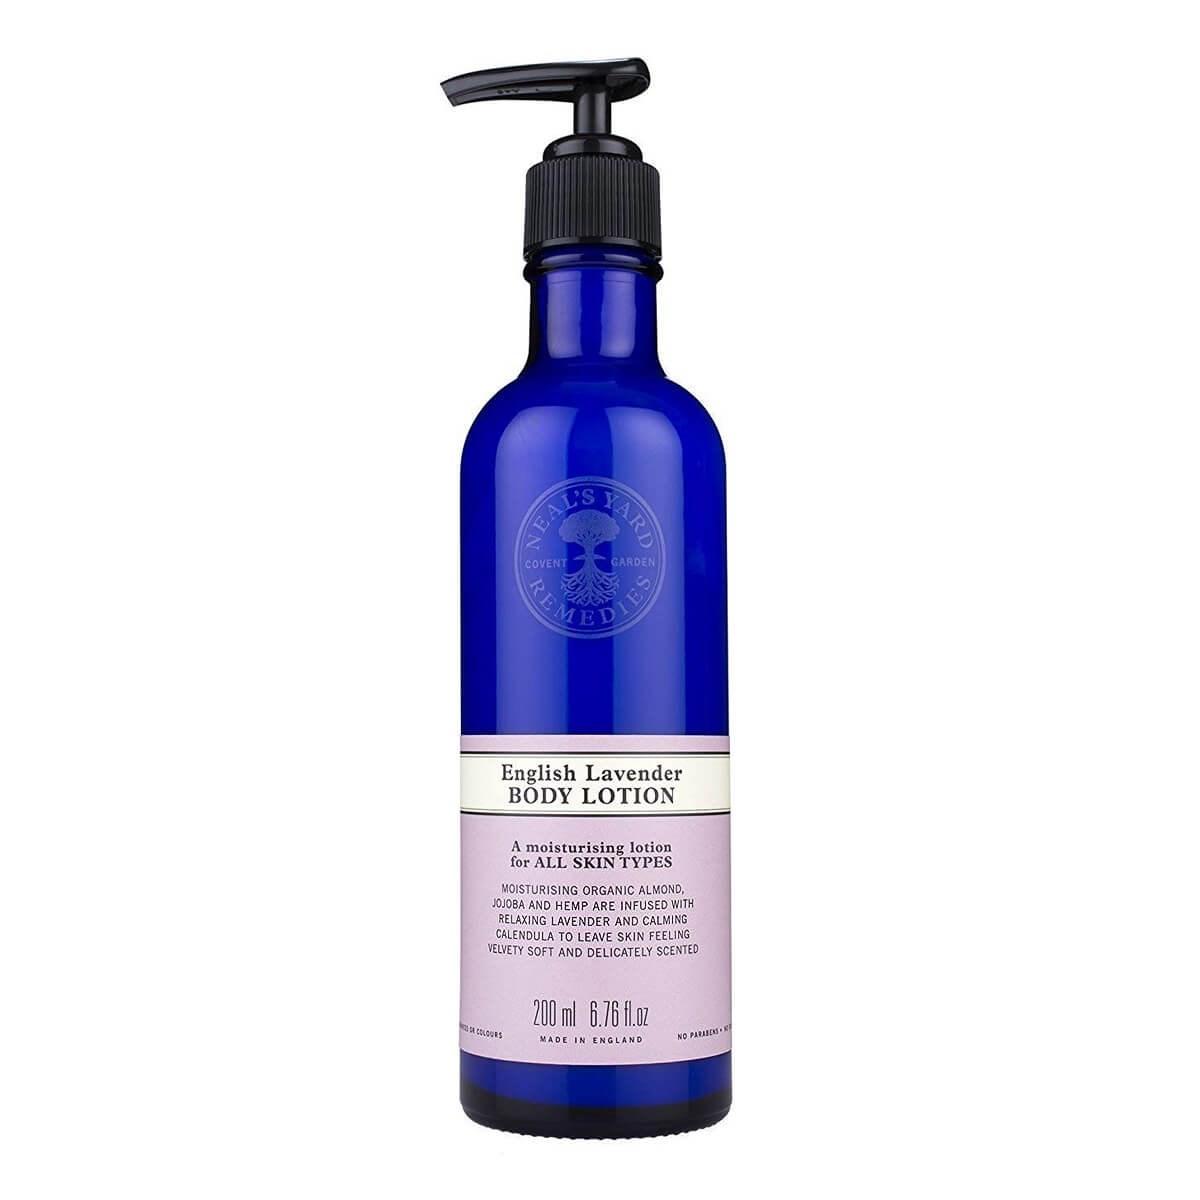 Neal's Yard Remedies English Lavender Body Lotion